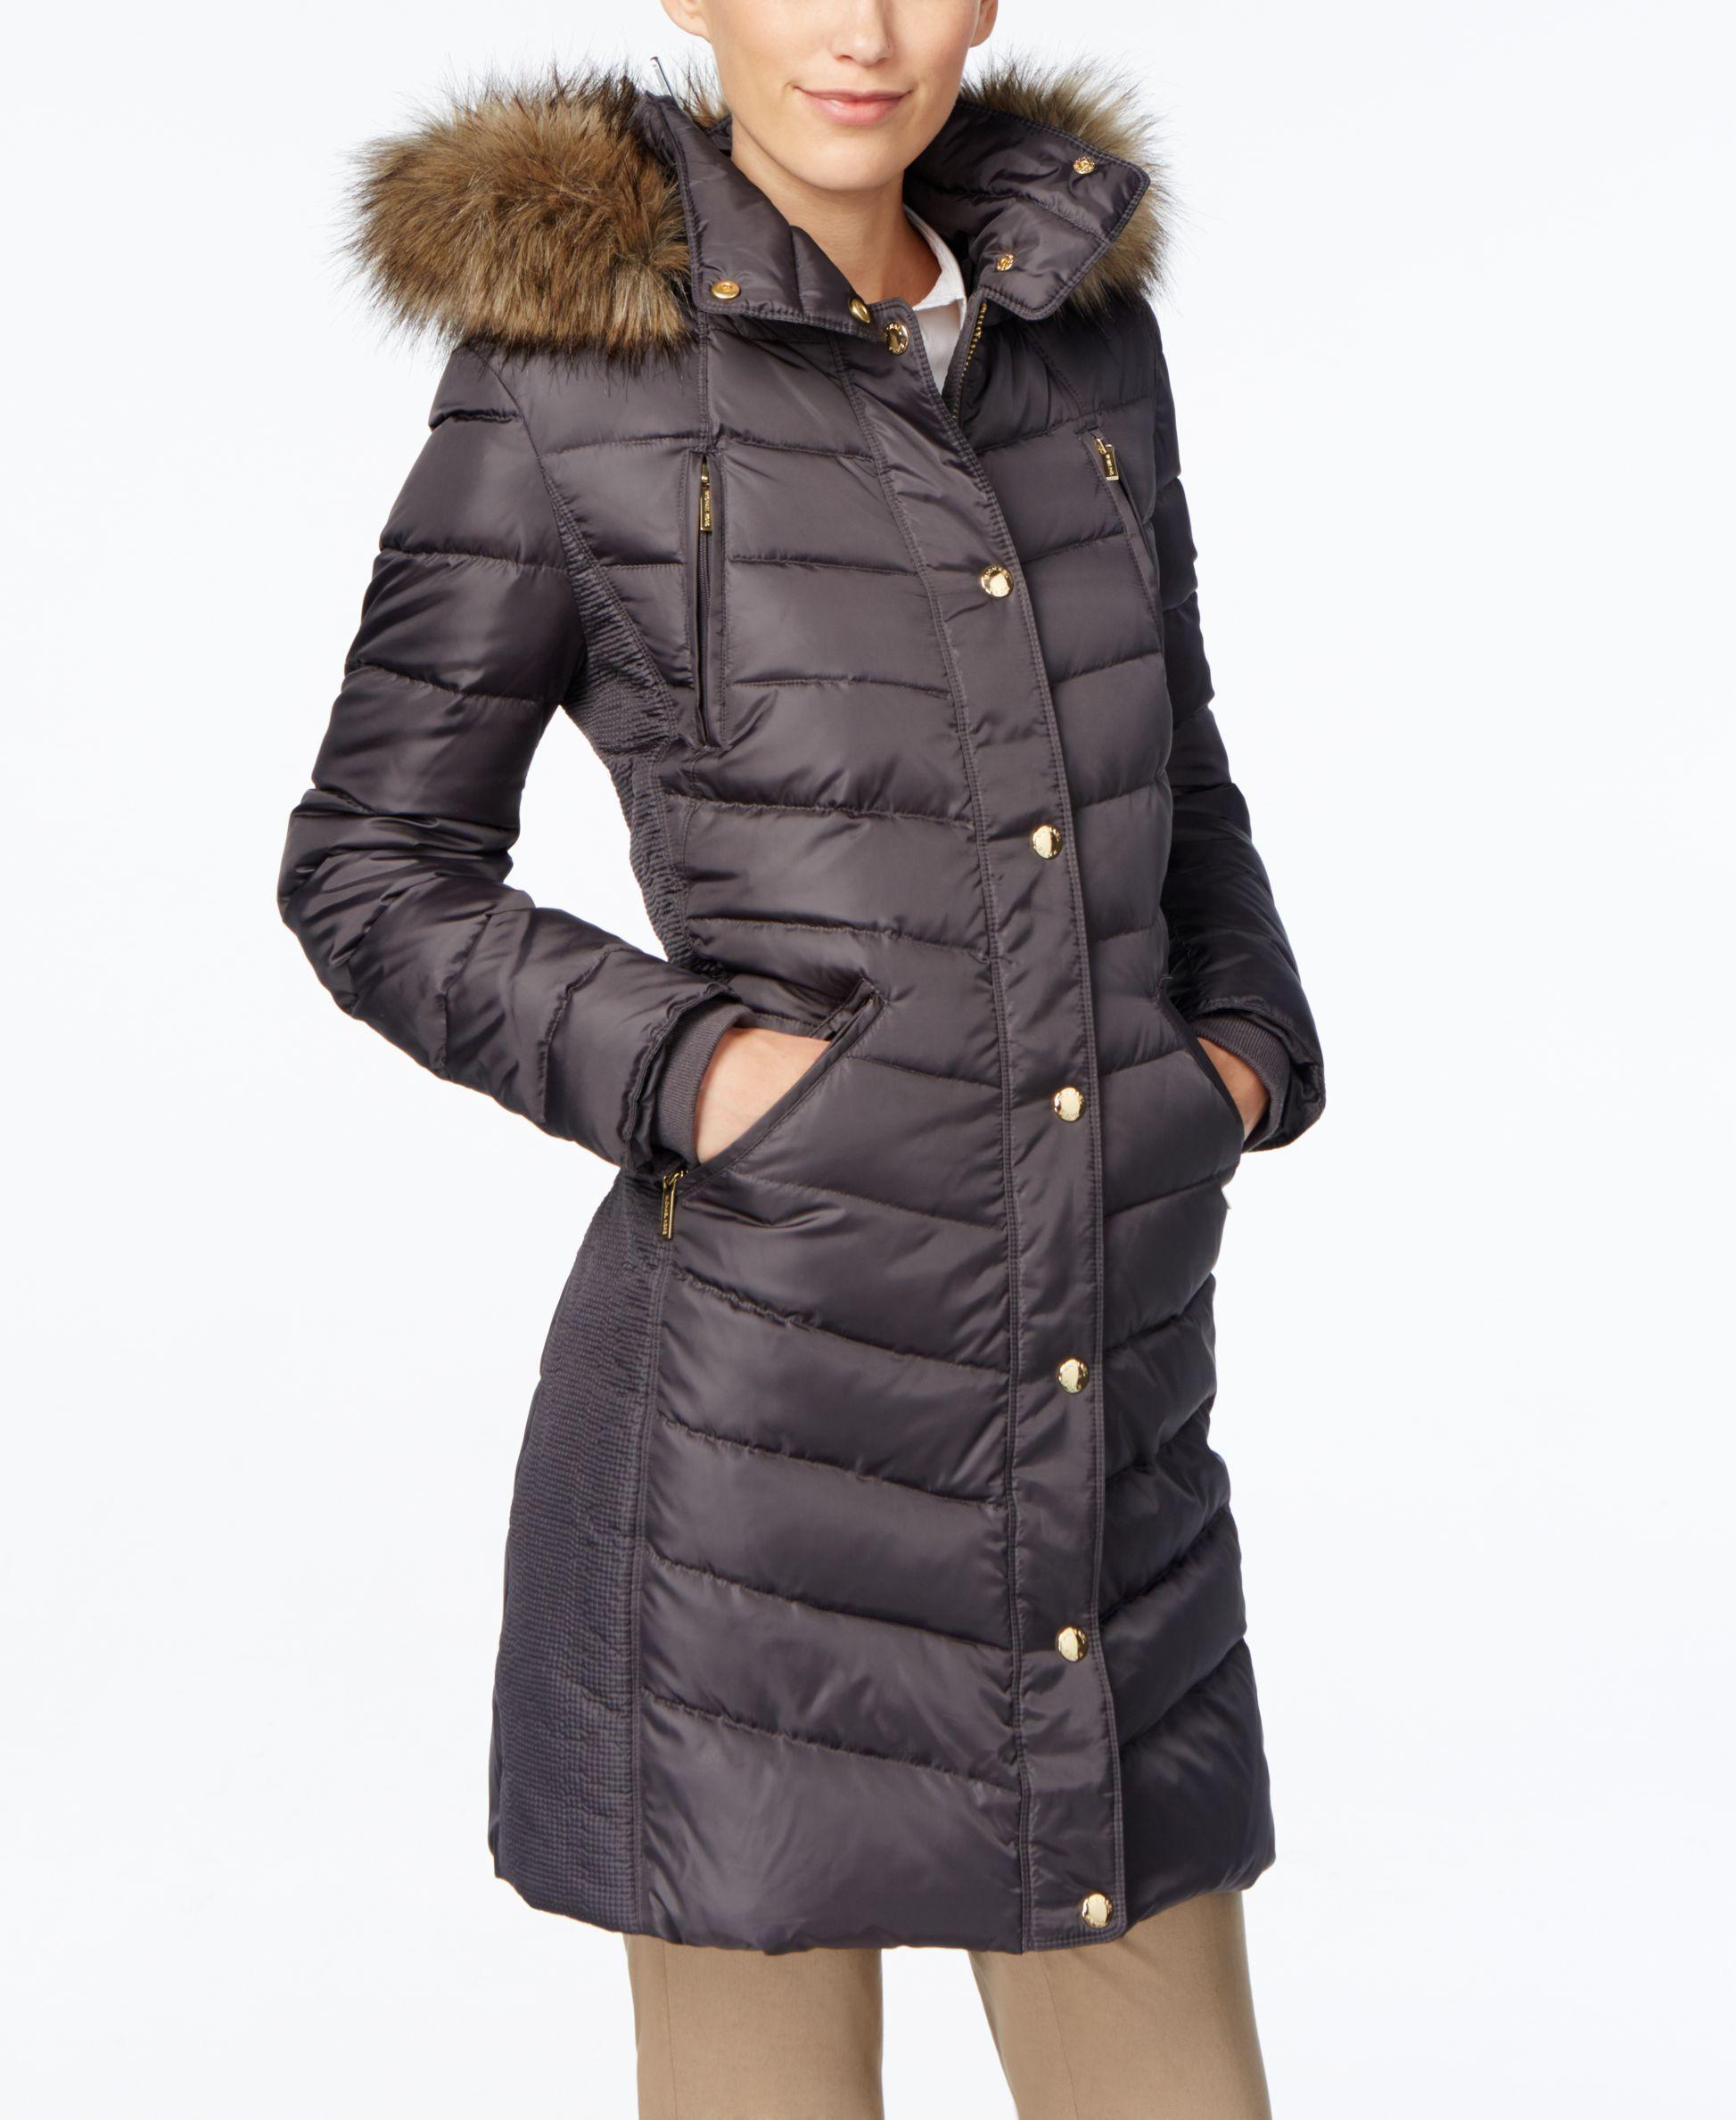 83302f1d6b23 Lyst - Michael Kors Petite Faux-Fur-Trimmed Down Puffer Coat in Gray